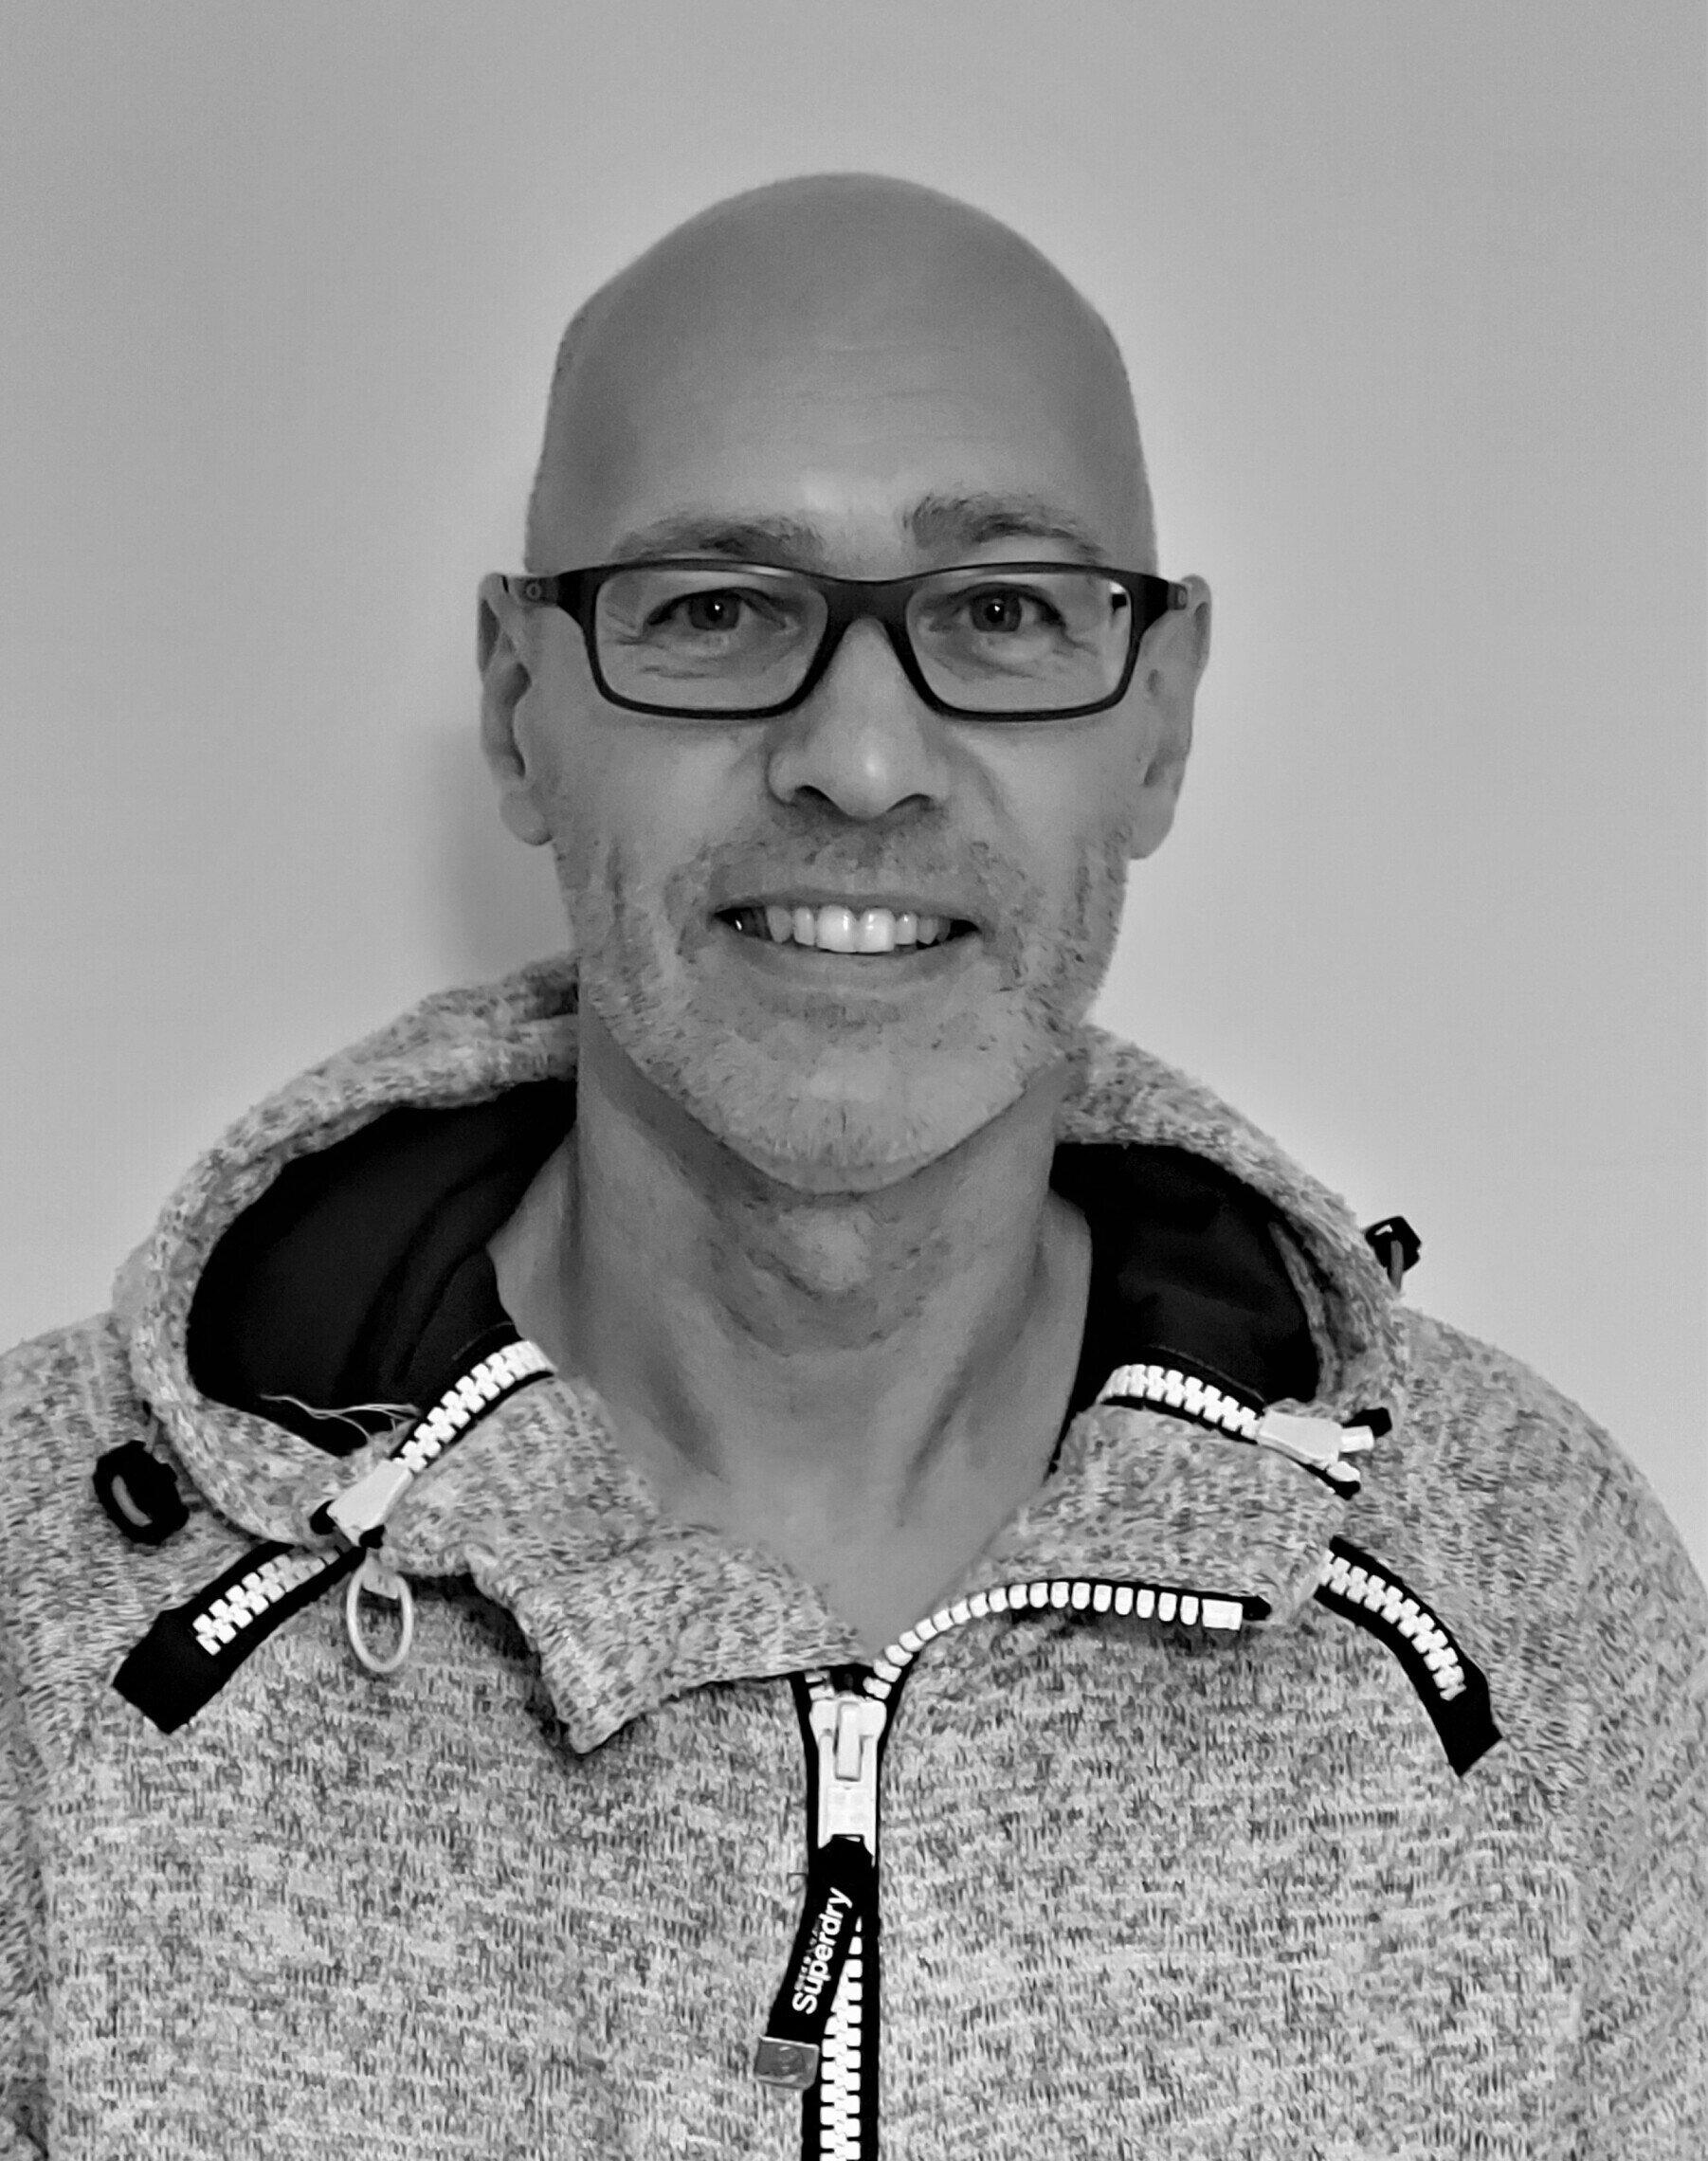 Markus Reifers